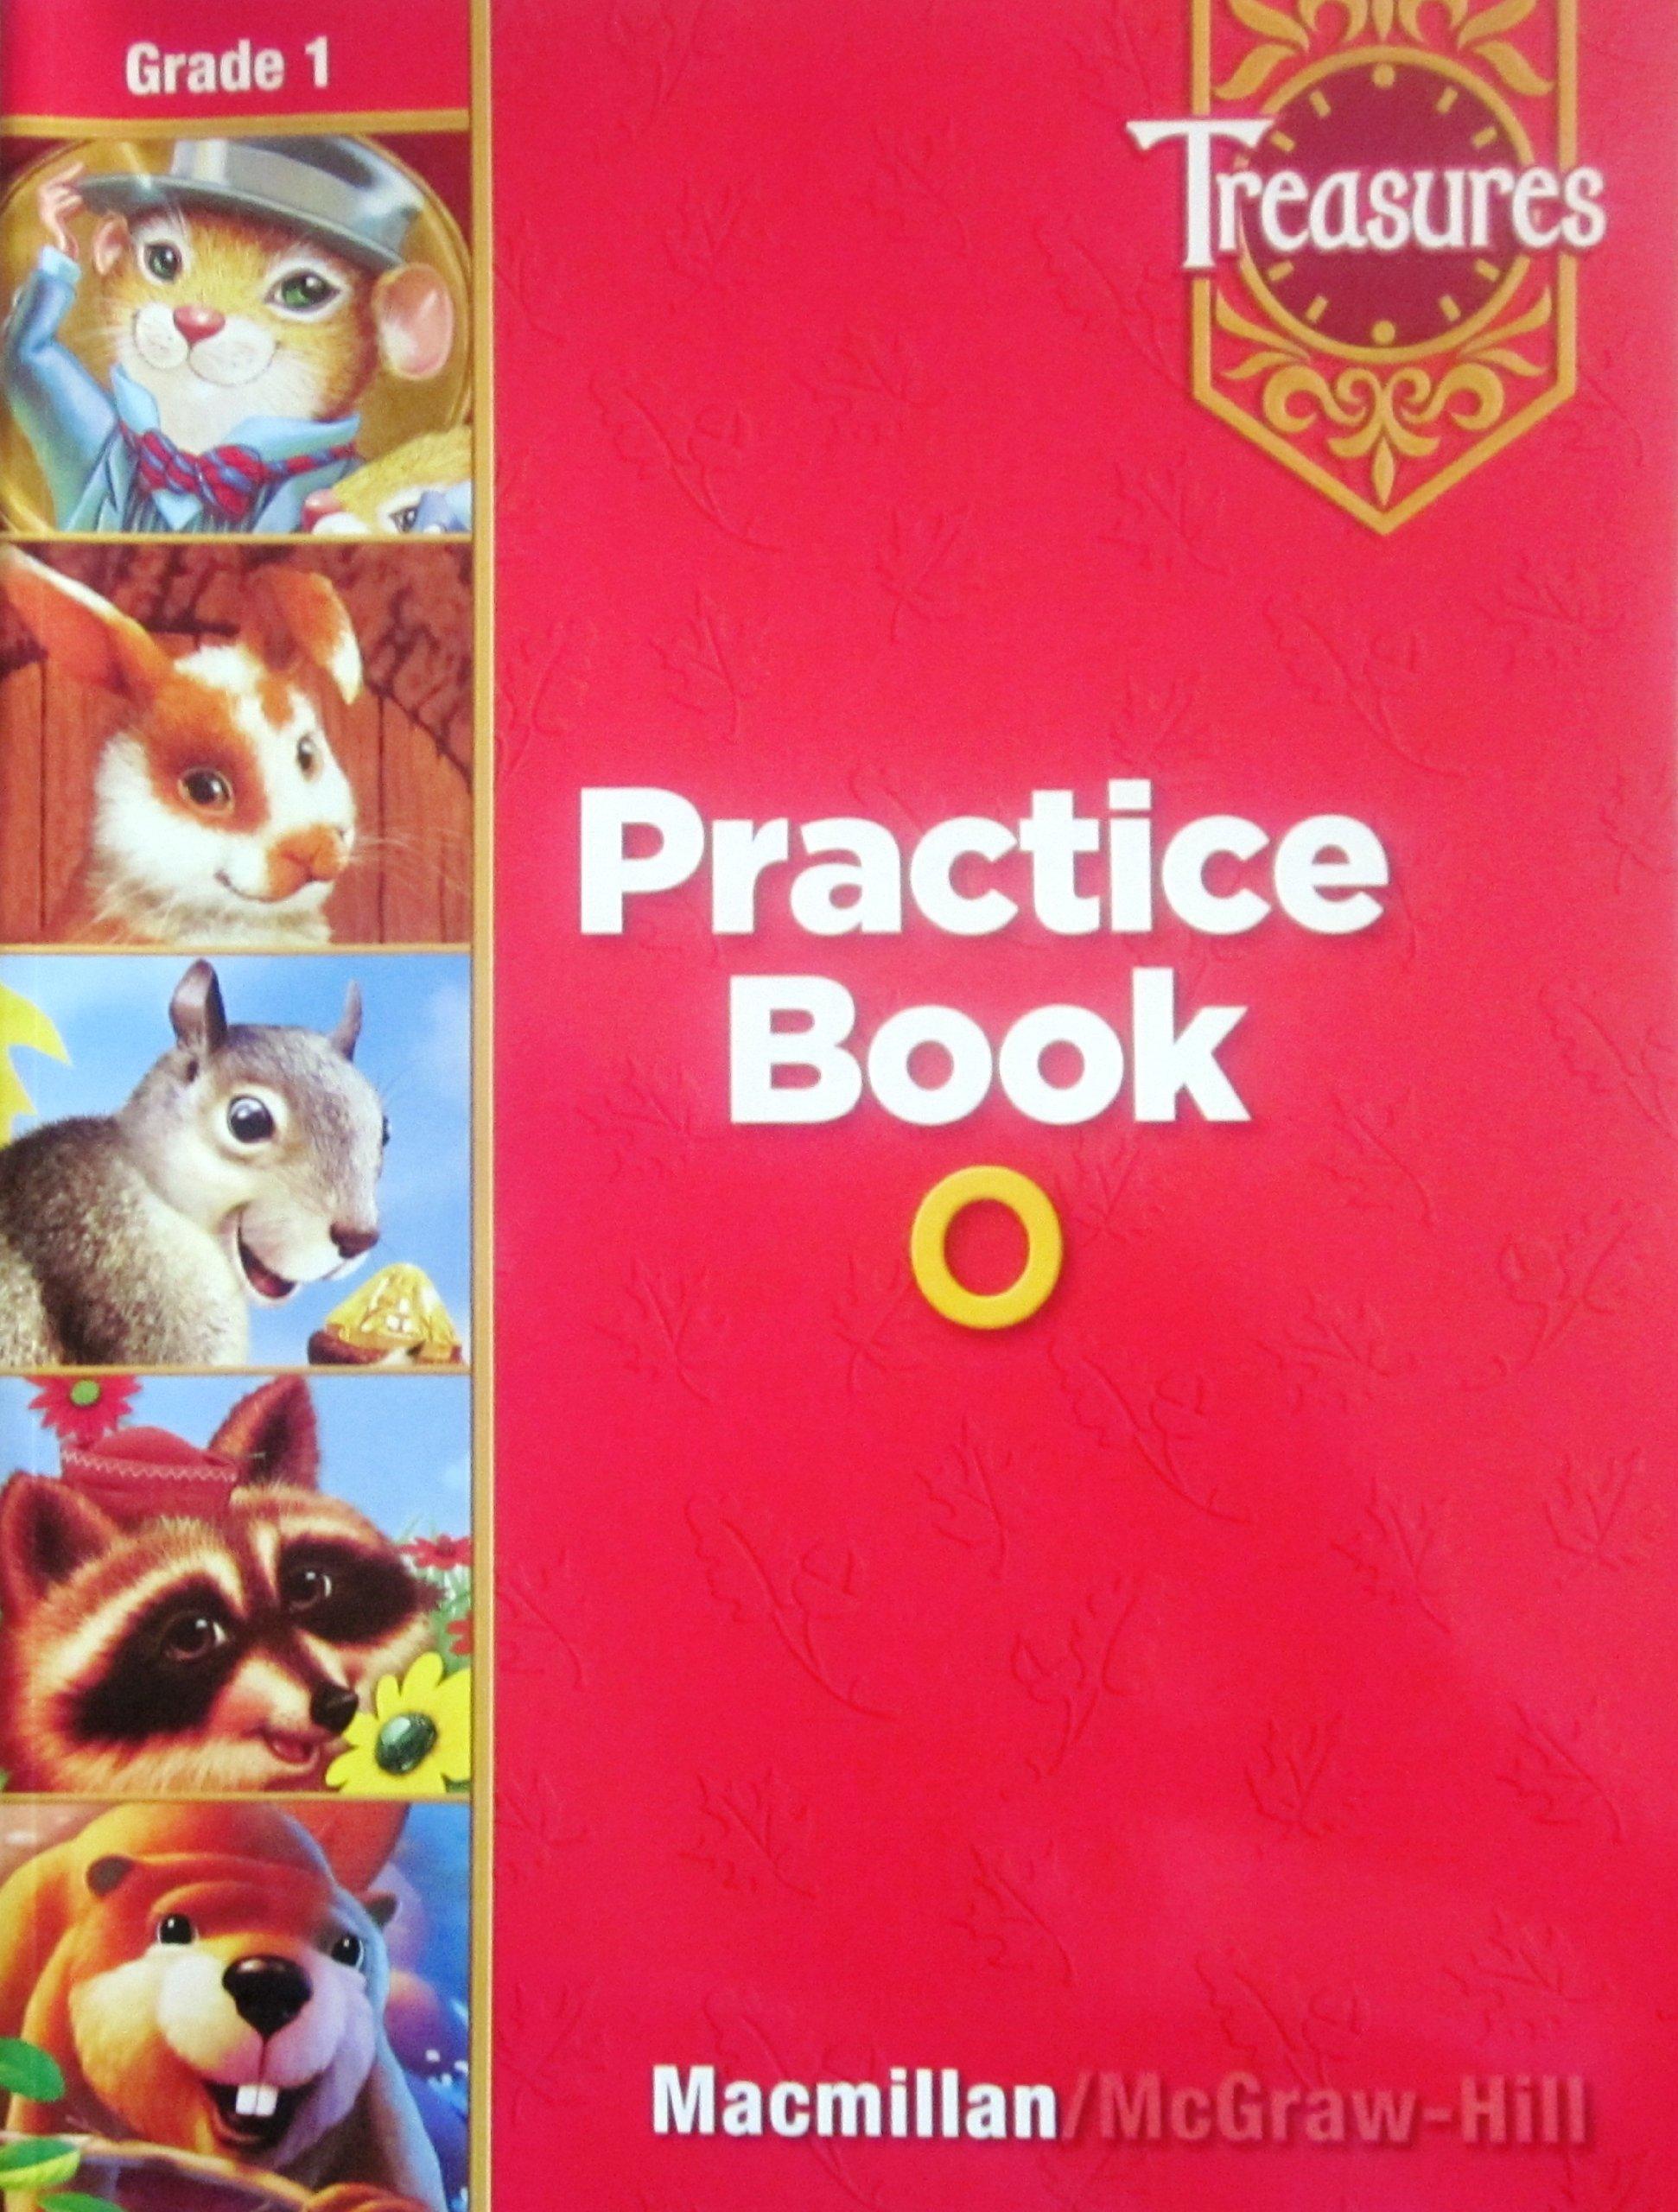 Treasures Practice Book O: Grade 1: macmillan: 9780022009182